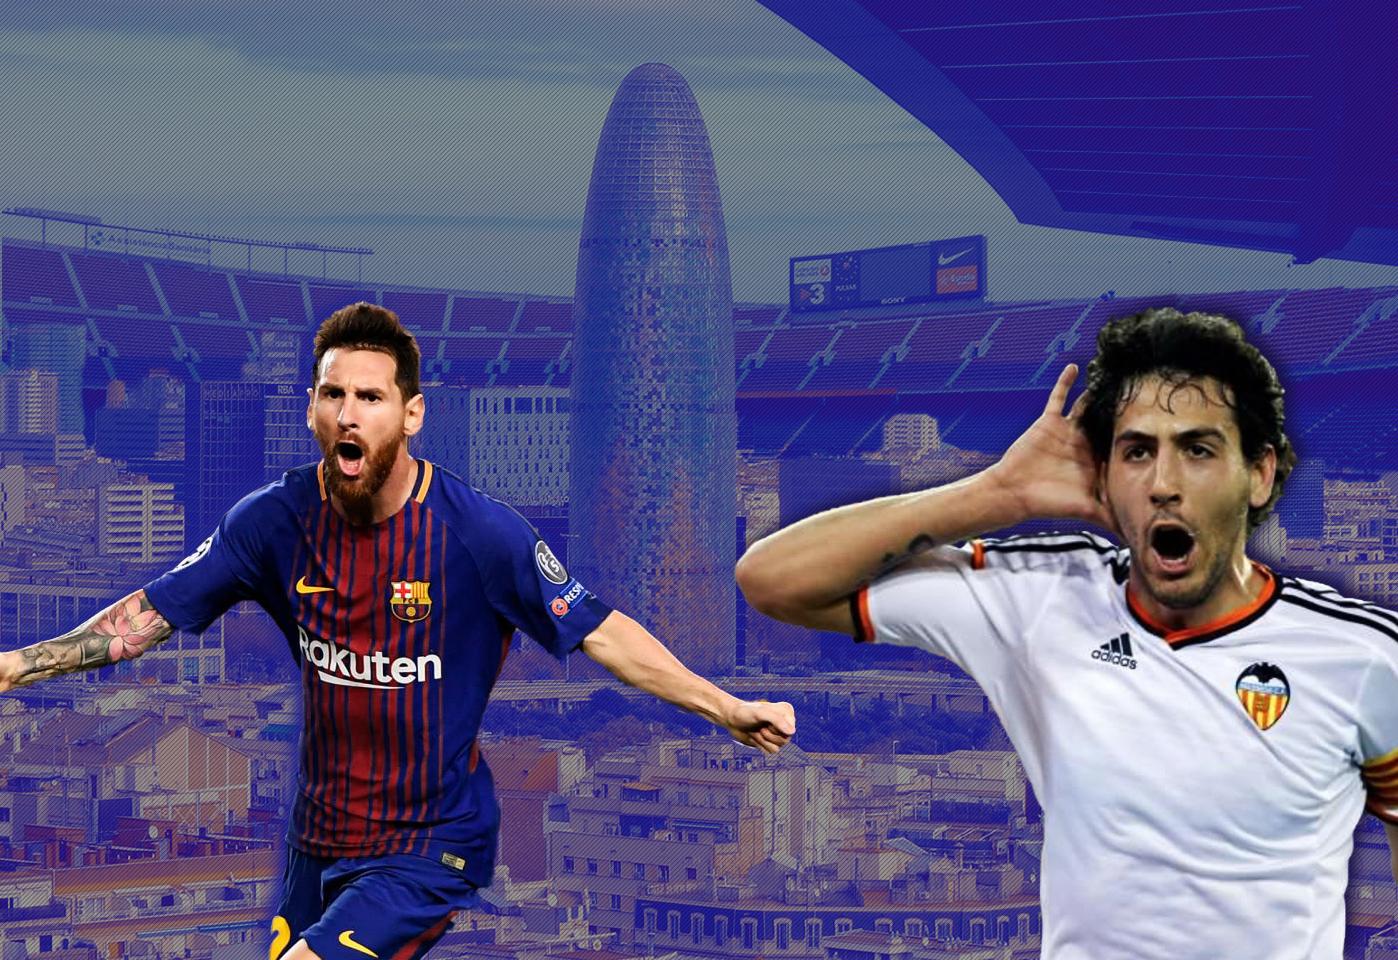 F.C. Barcelona vs Valencia C.F. - Sports and Travel